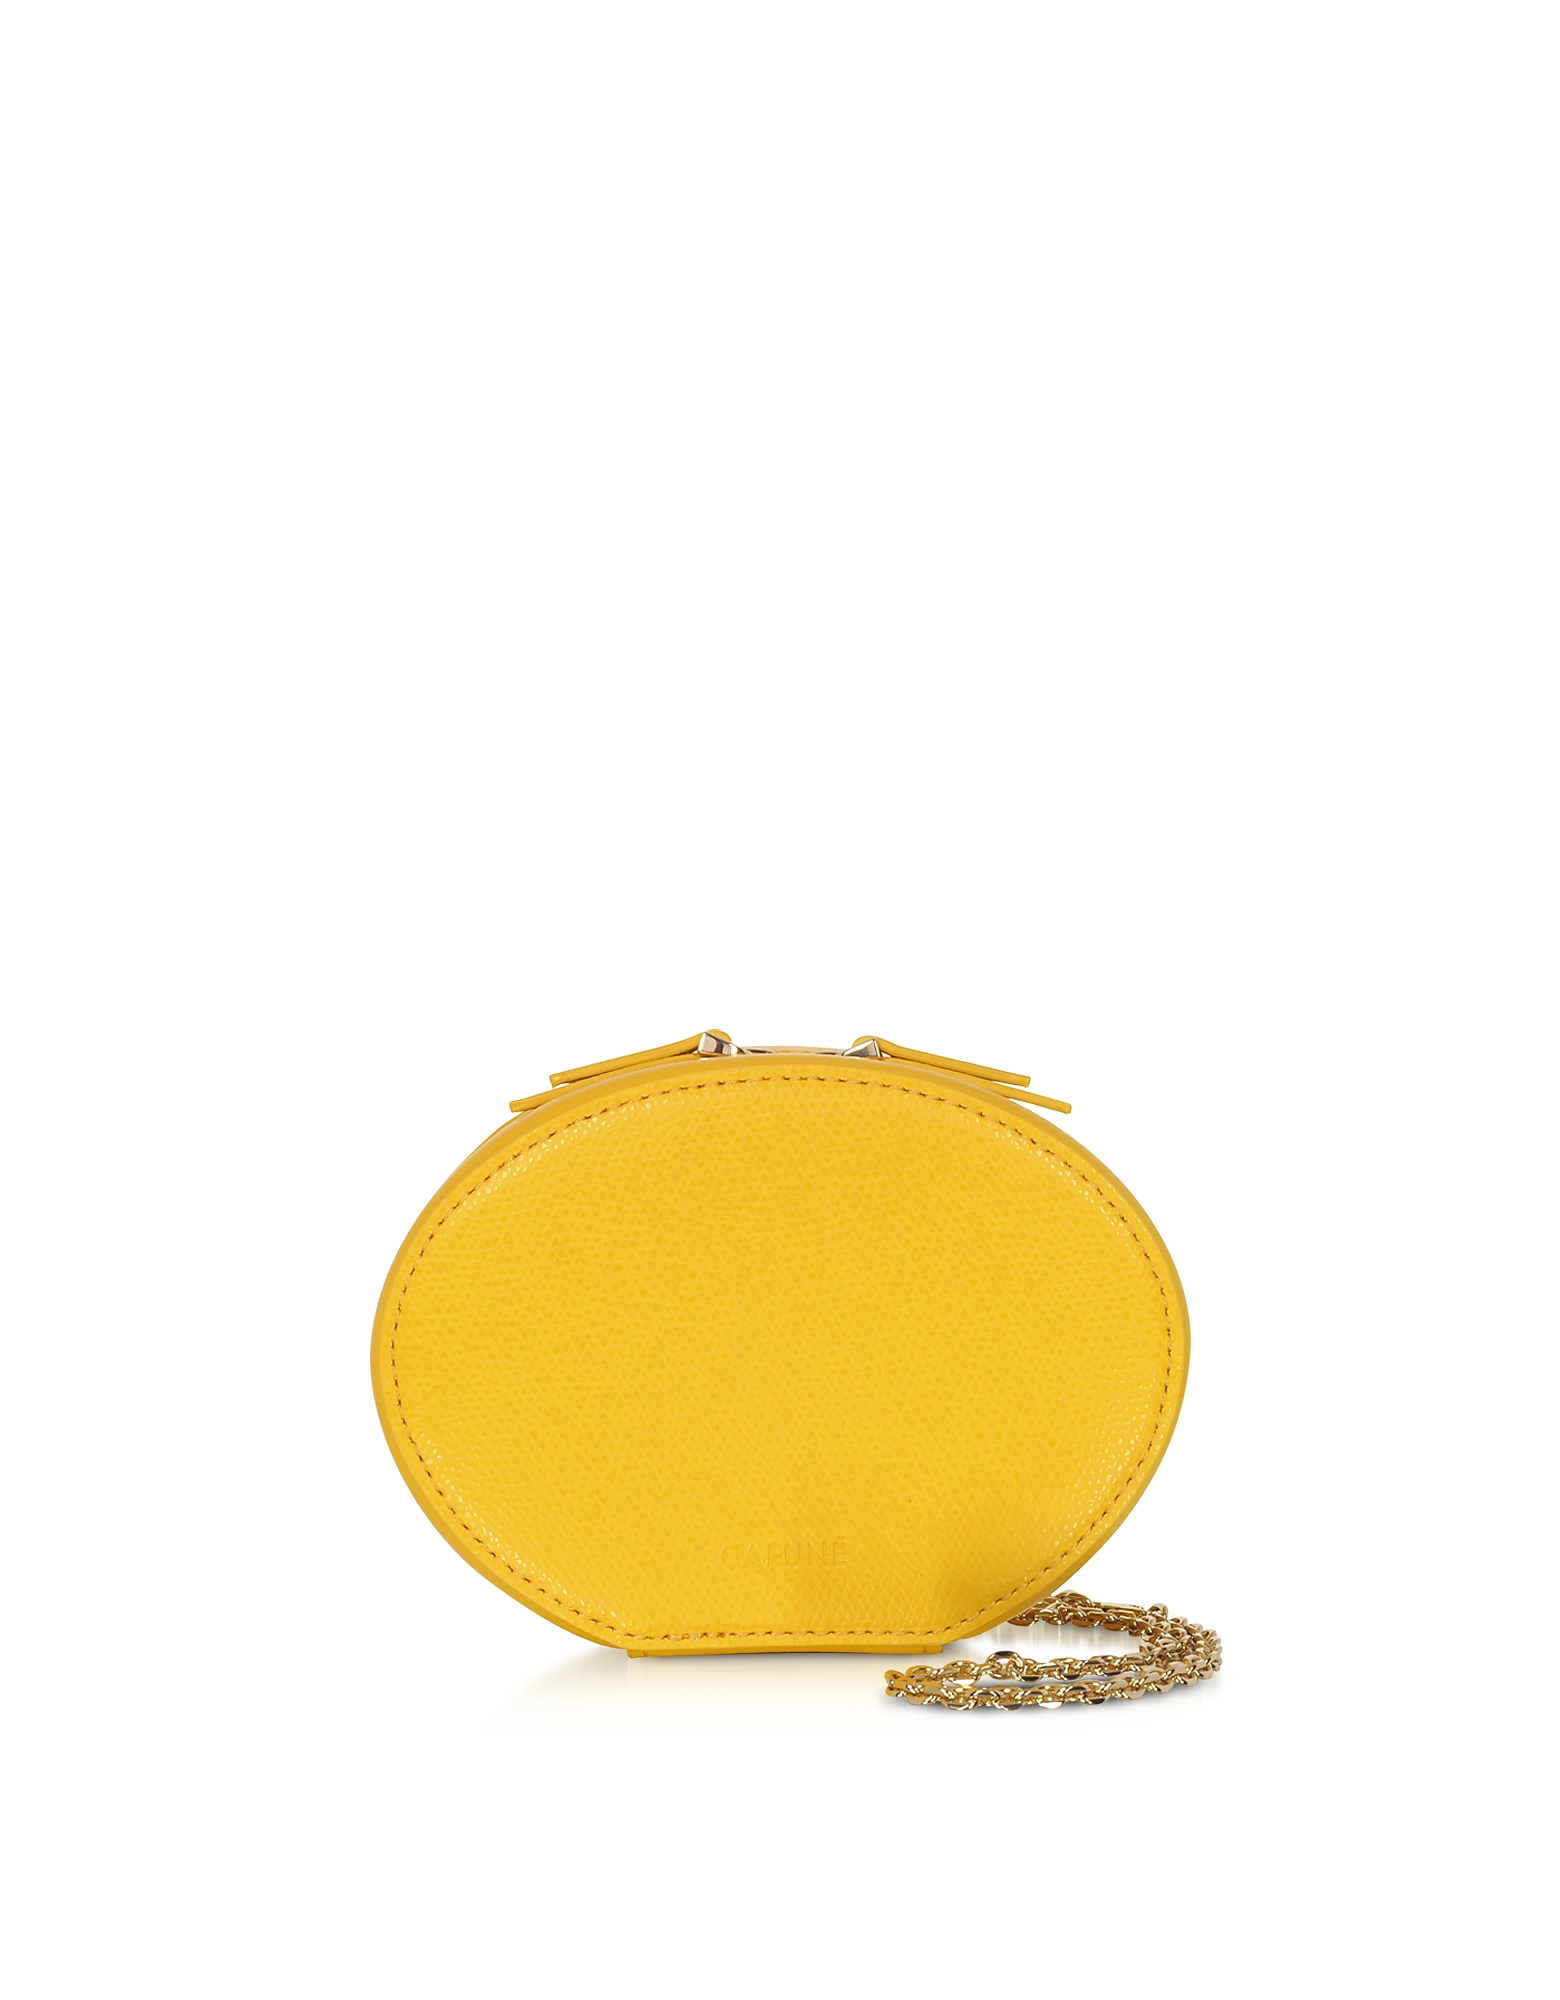 Cafuné Designer Handbags, Dandelion Yellow Leather Egg Chain Shoulder Bag